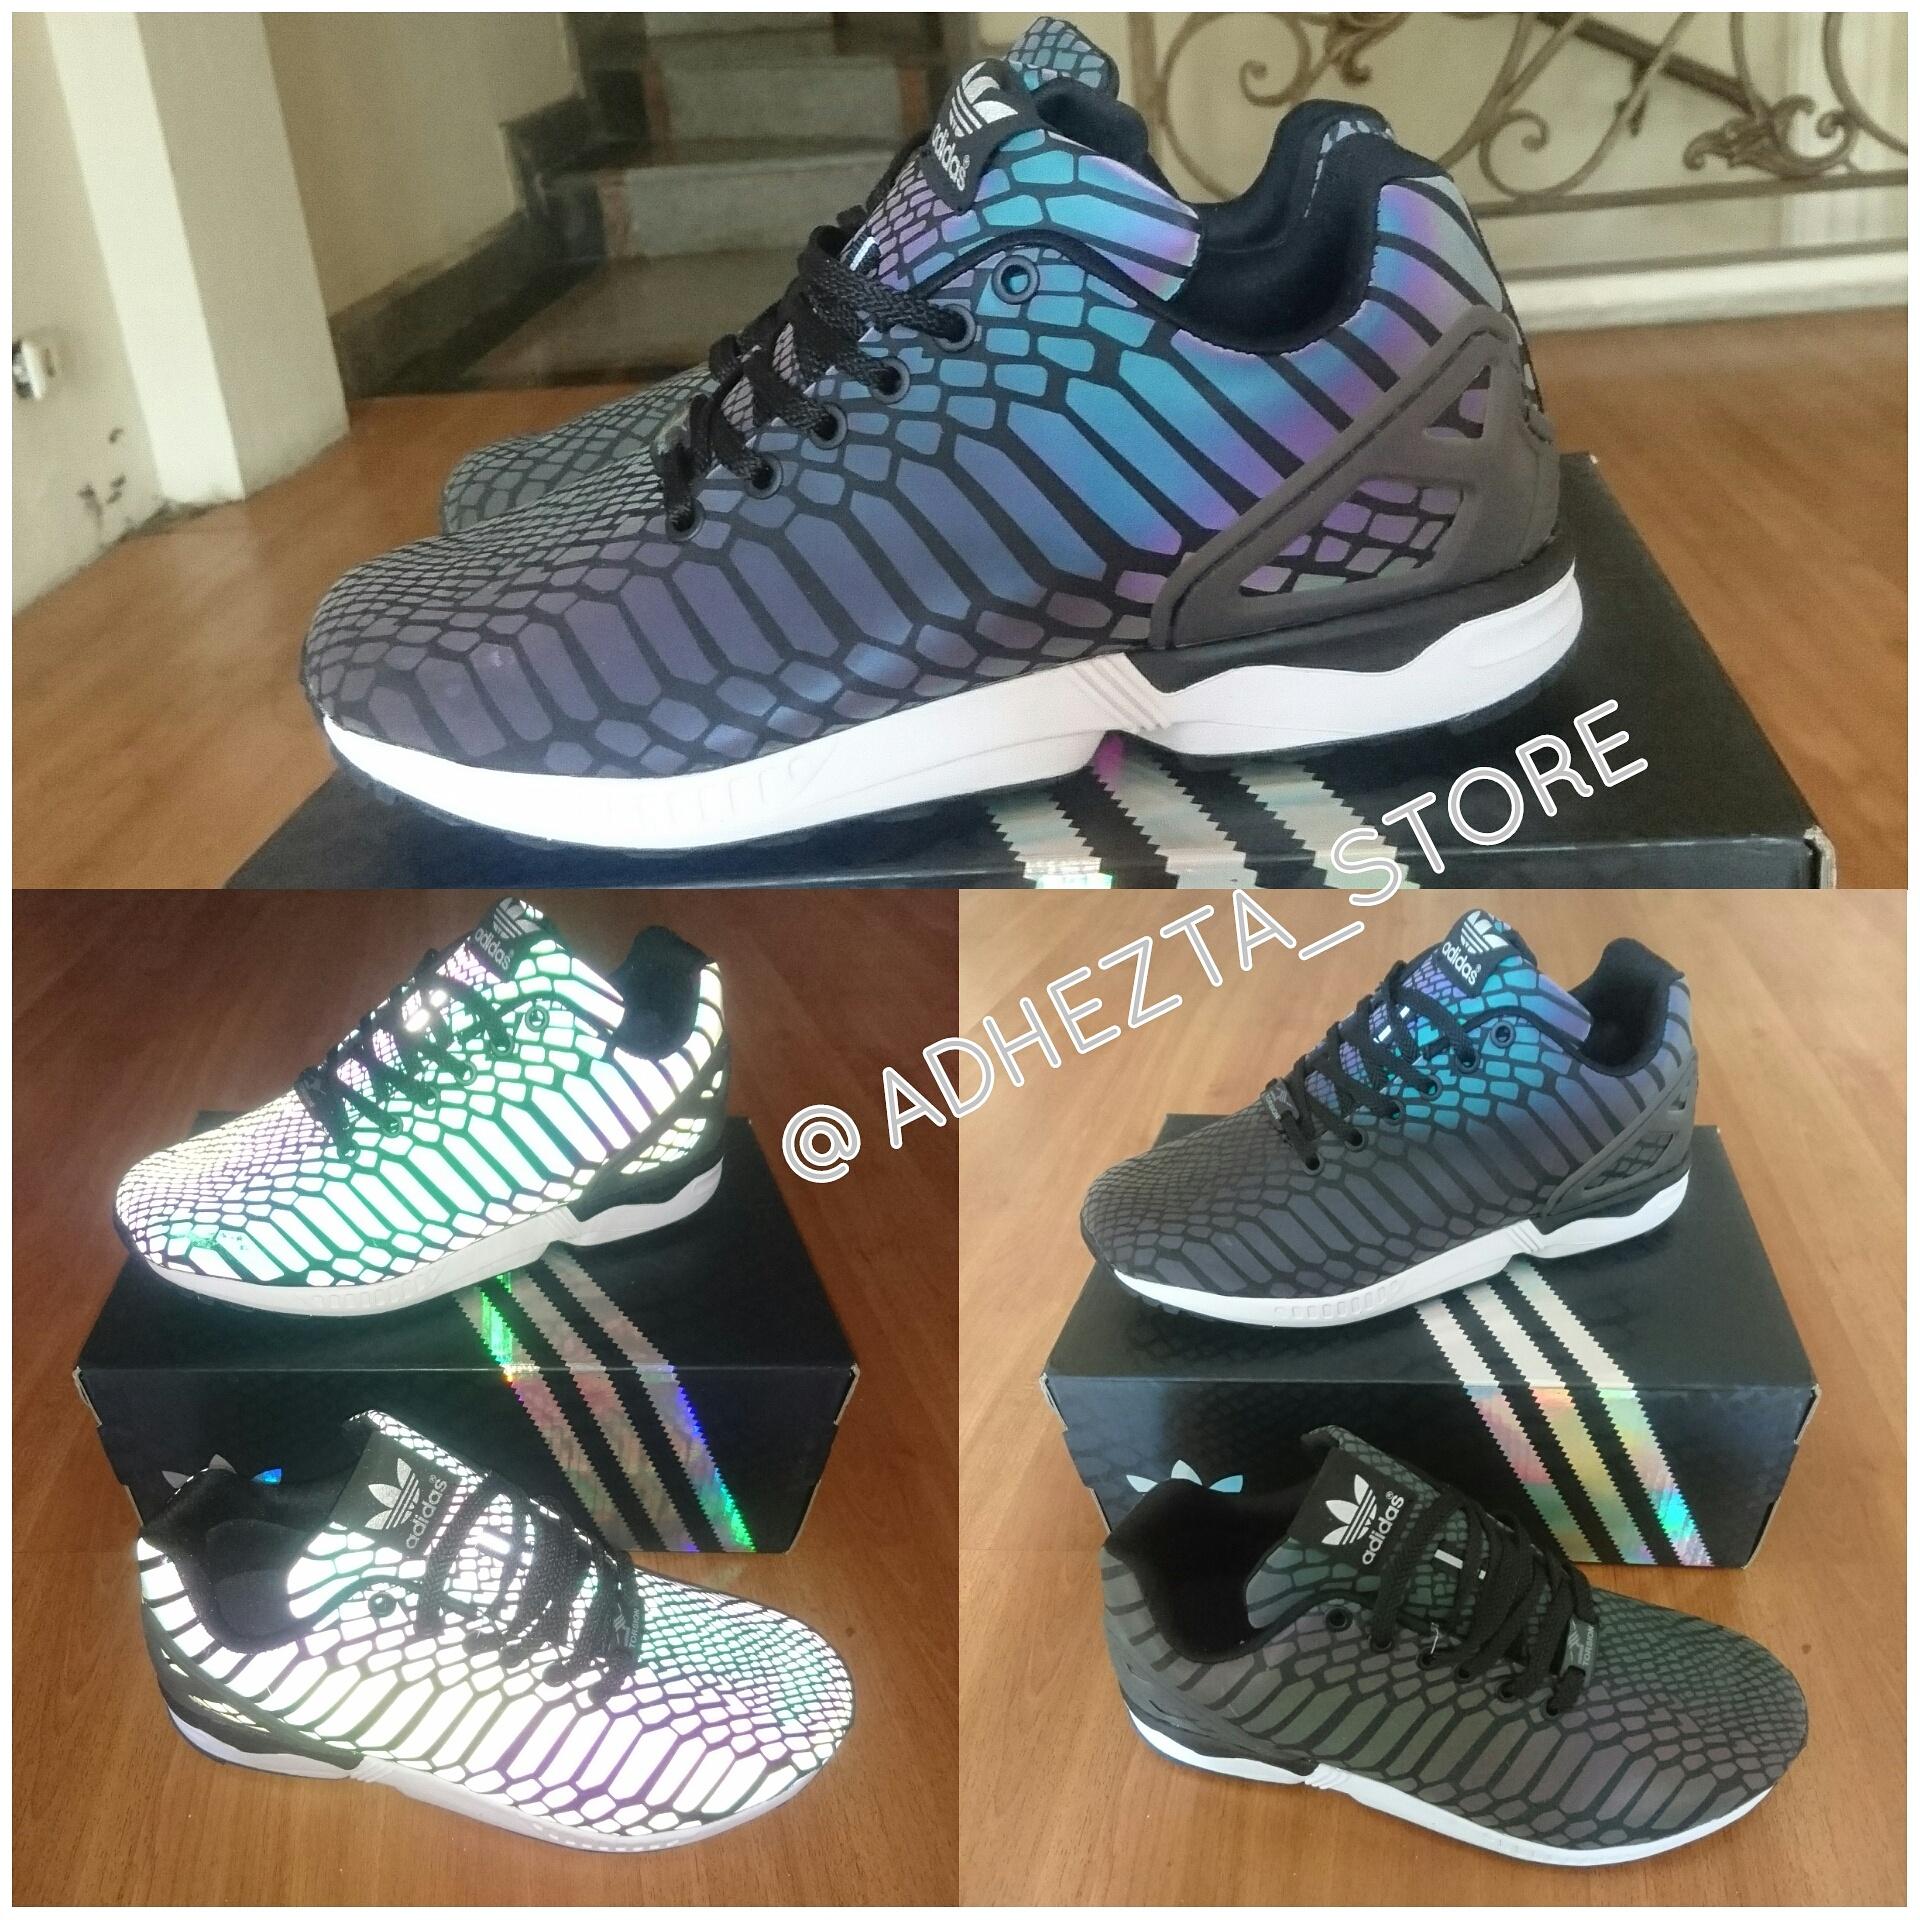 a3af28e24addb ... ireland jual sepatu adidas zx flux xeno premium quality adhezta sport  tokopedia bfa3b 4f87e